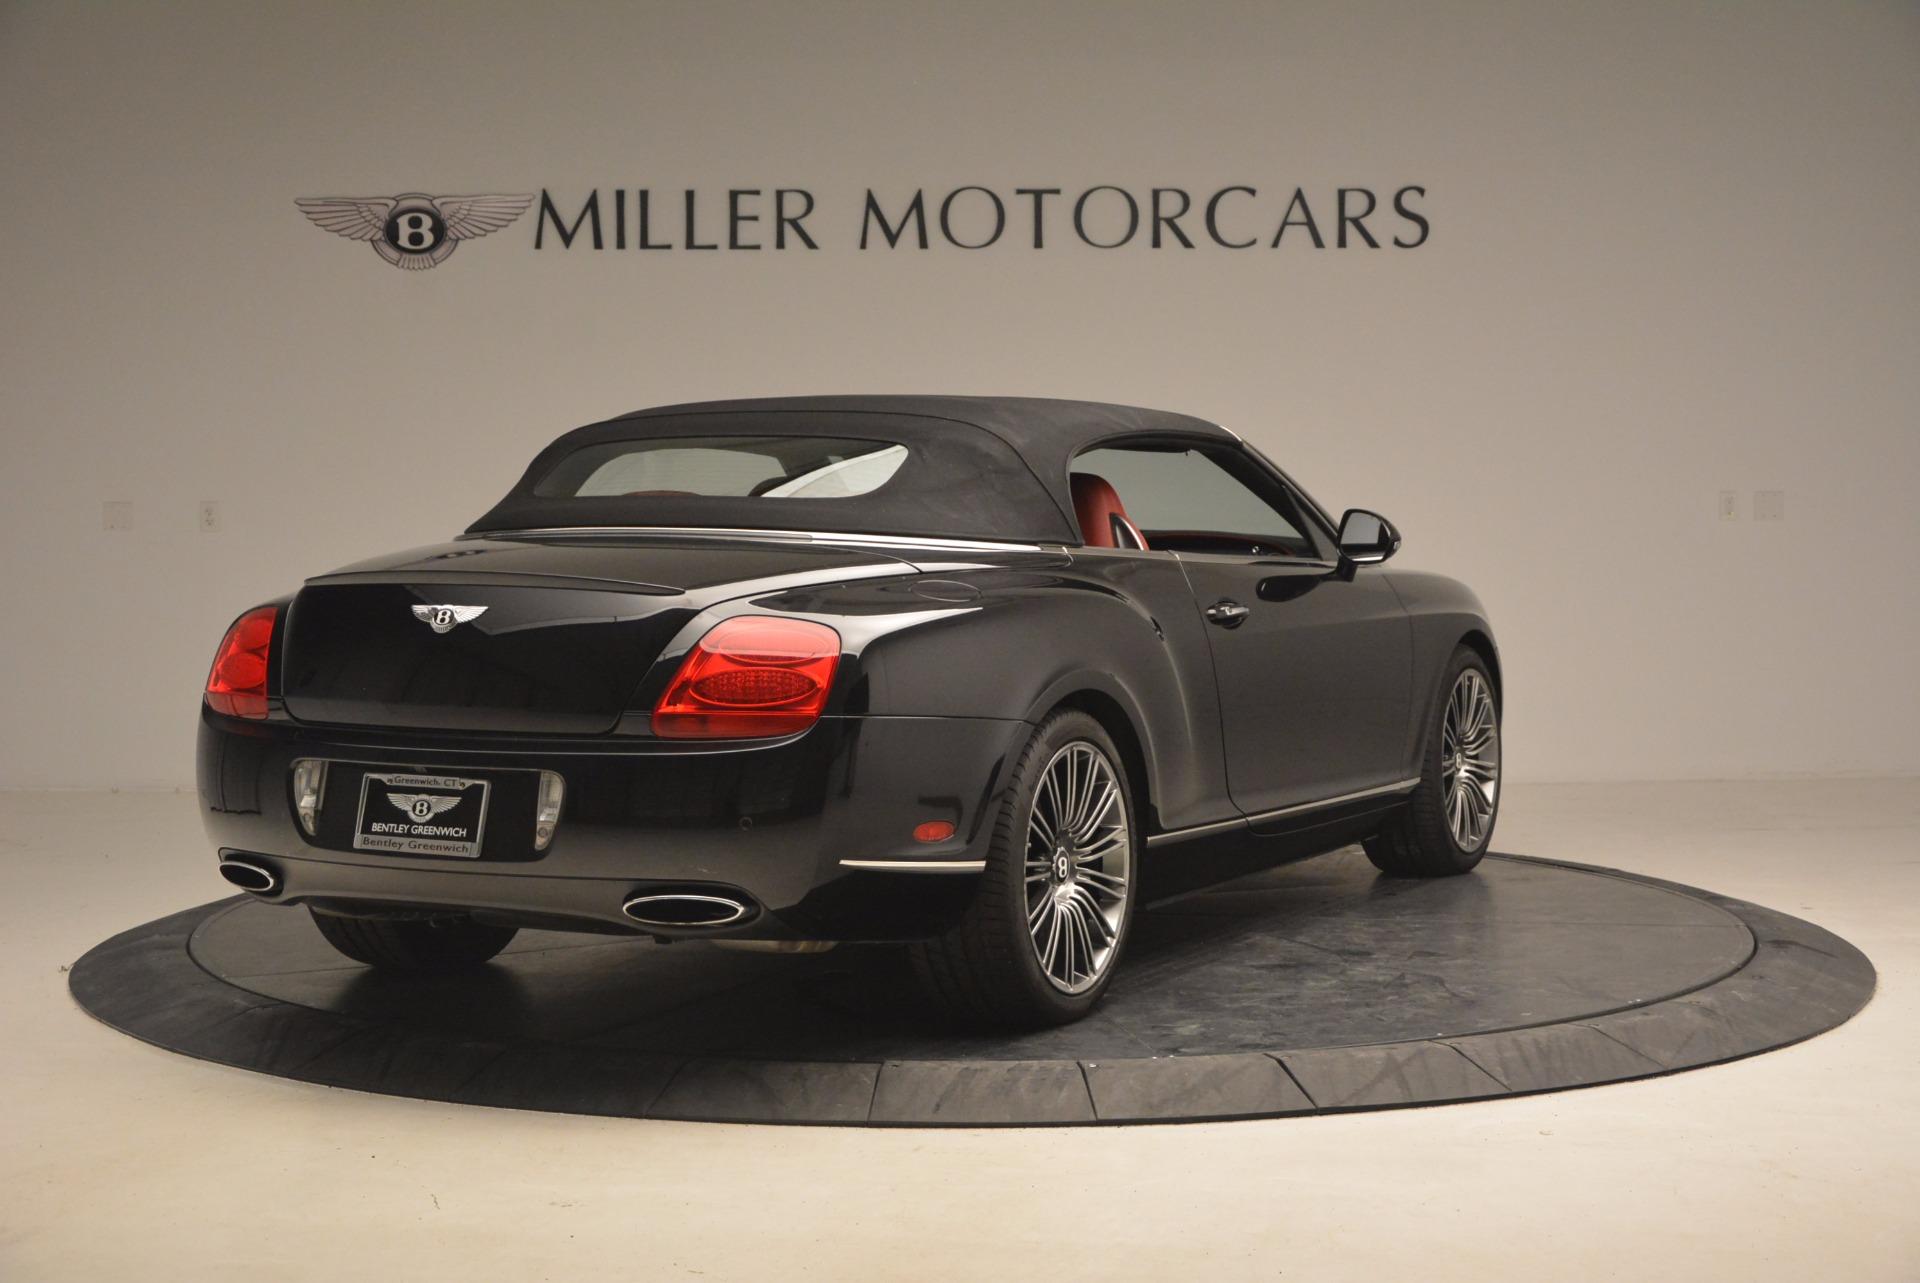 Used 2010 Bentley Continental GT Speed For Sale In Westport, CT 1298_p20